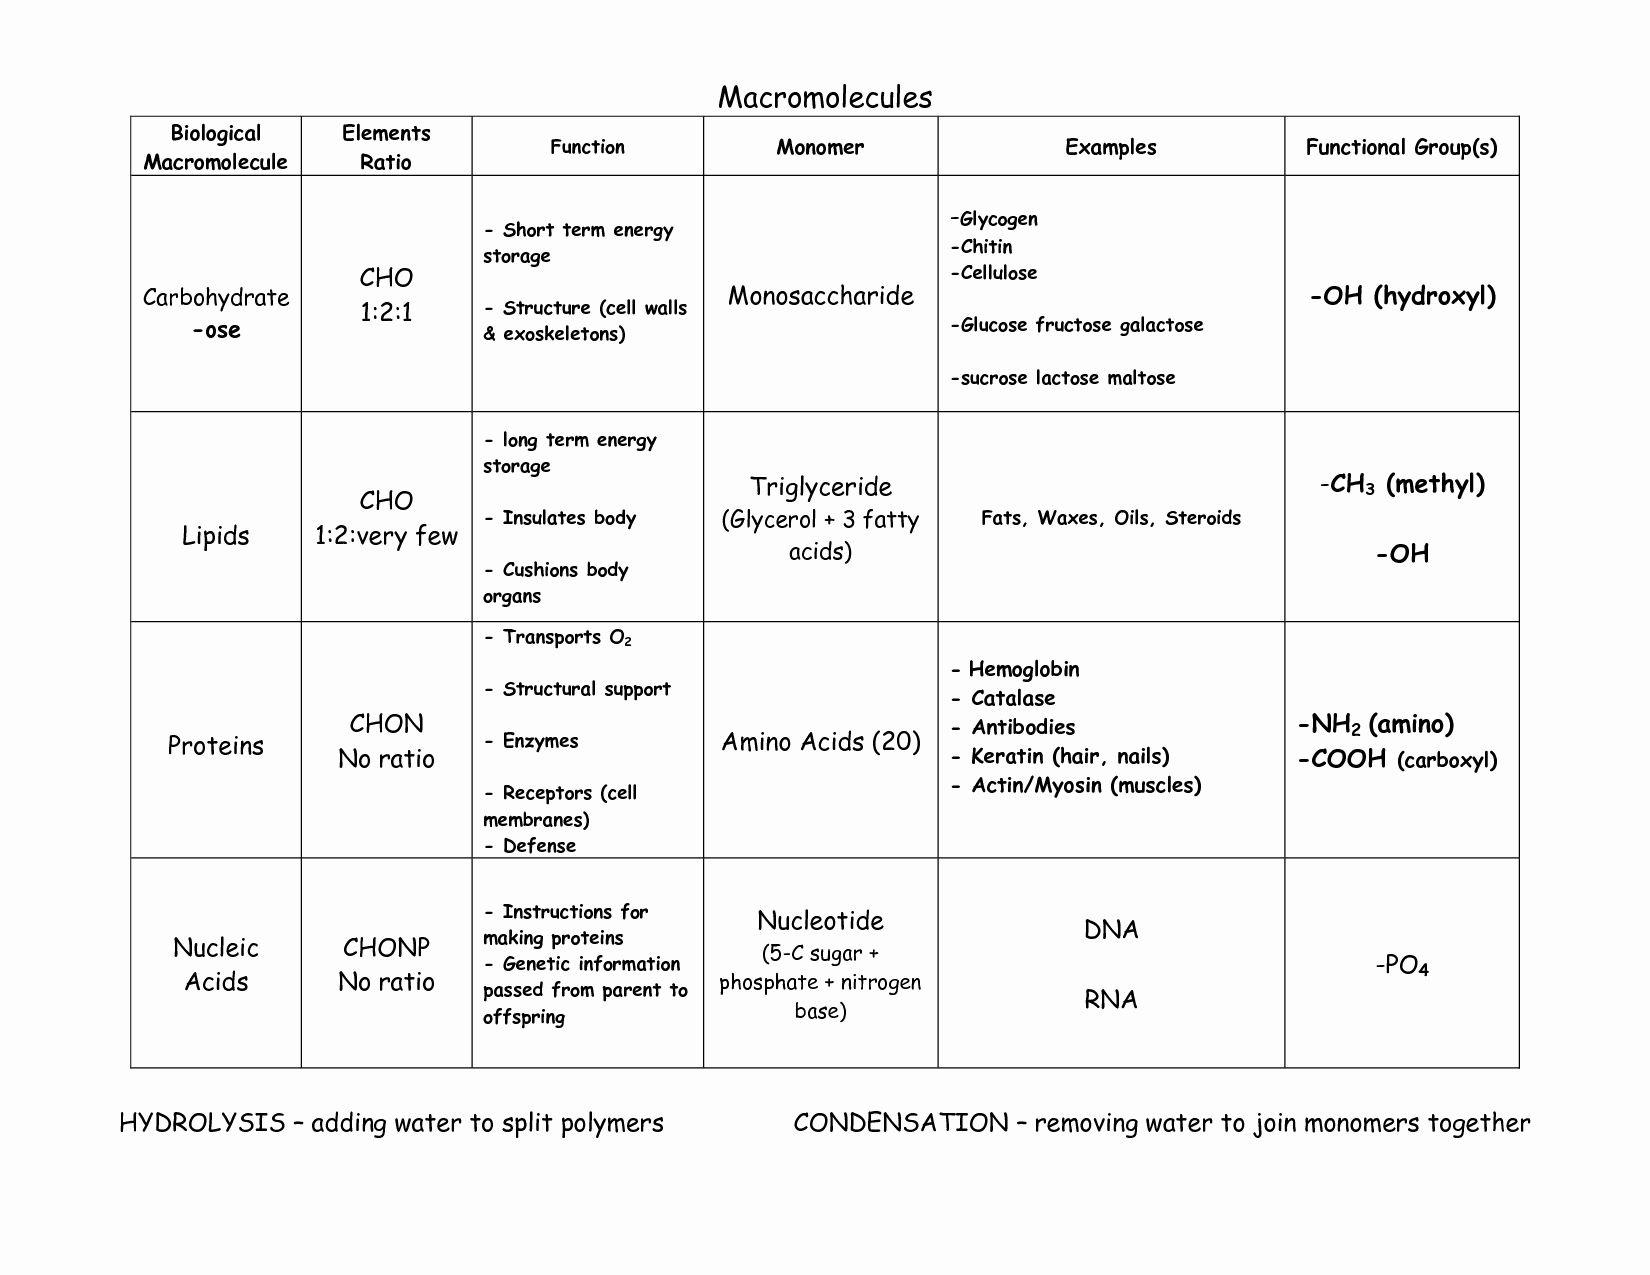 Organic Molecules Worksheet Answer Key Inspirational 14 Best Of Biology Macromolecules Worksheets And In 2020 Macromolecules Organic Molecules Macromolecules Biology